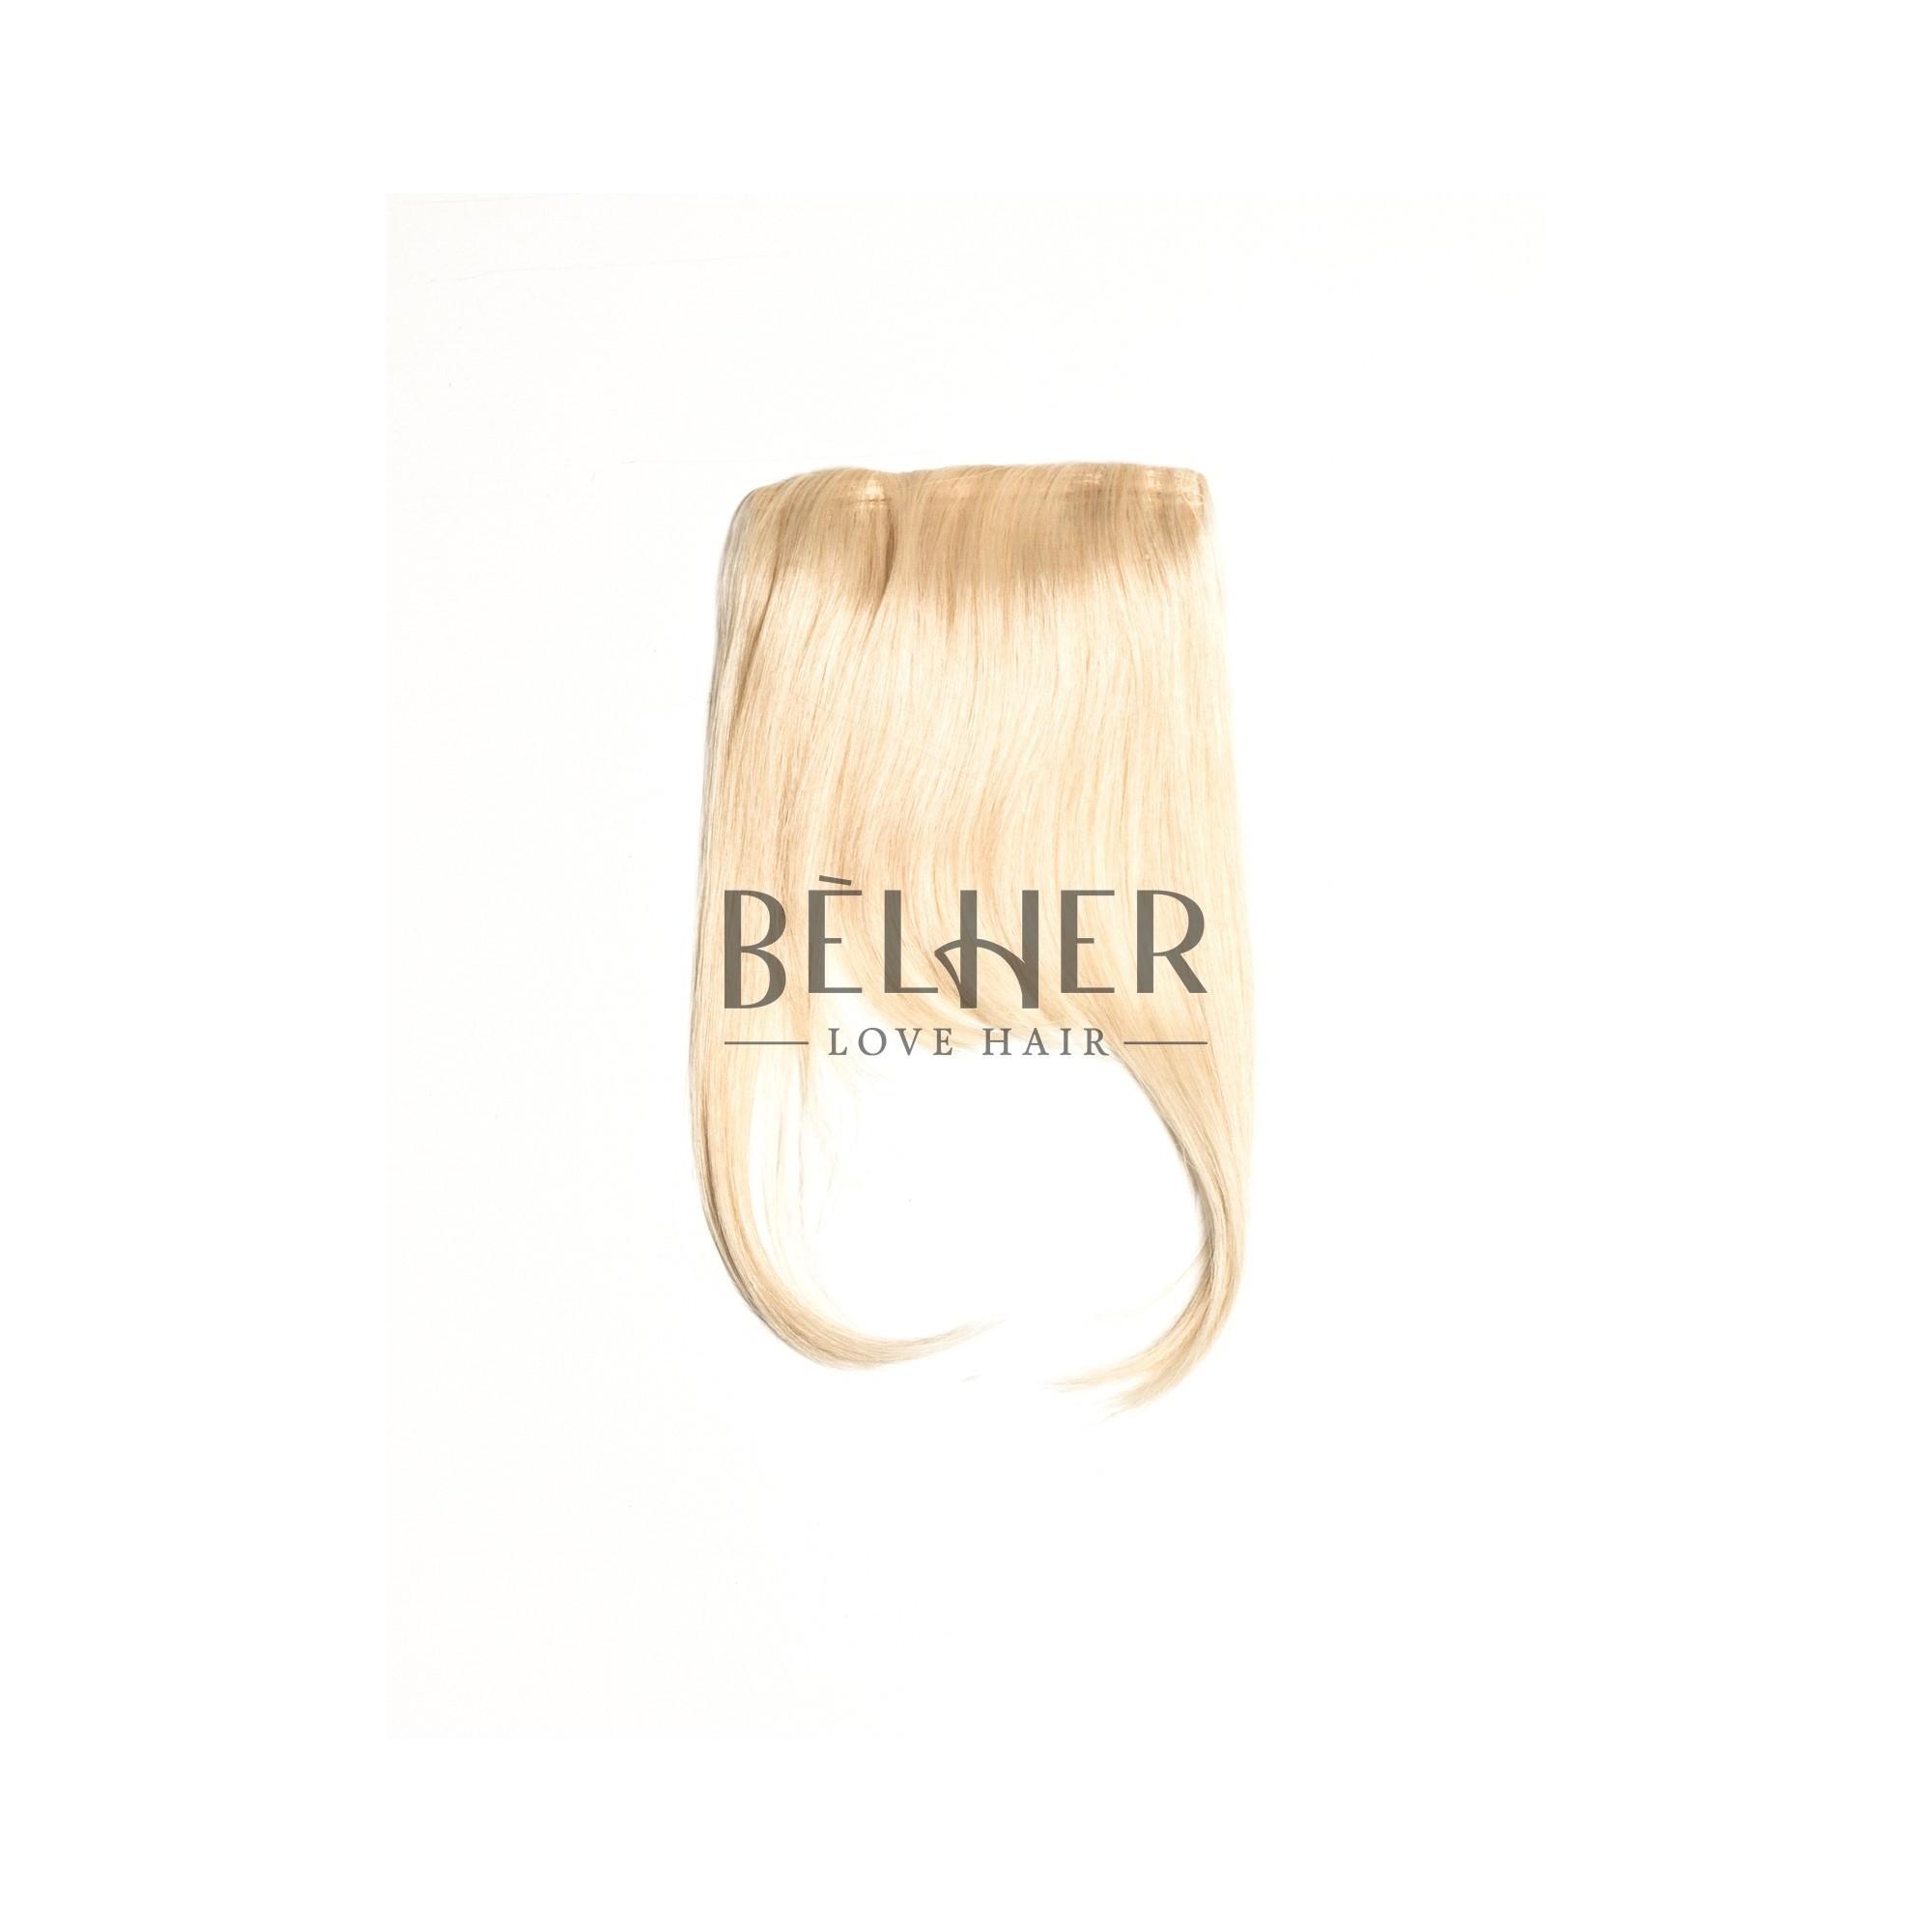 Breton Natural Blond Platinat imagine produs